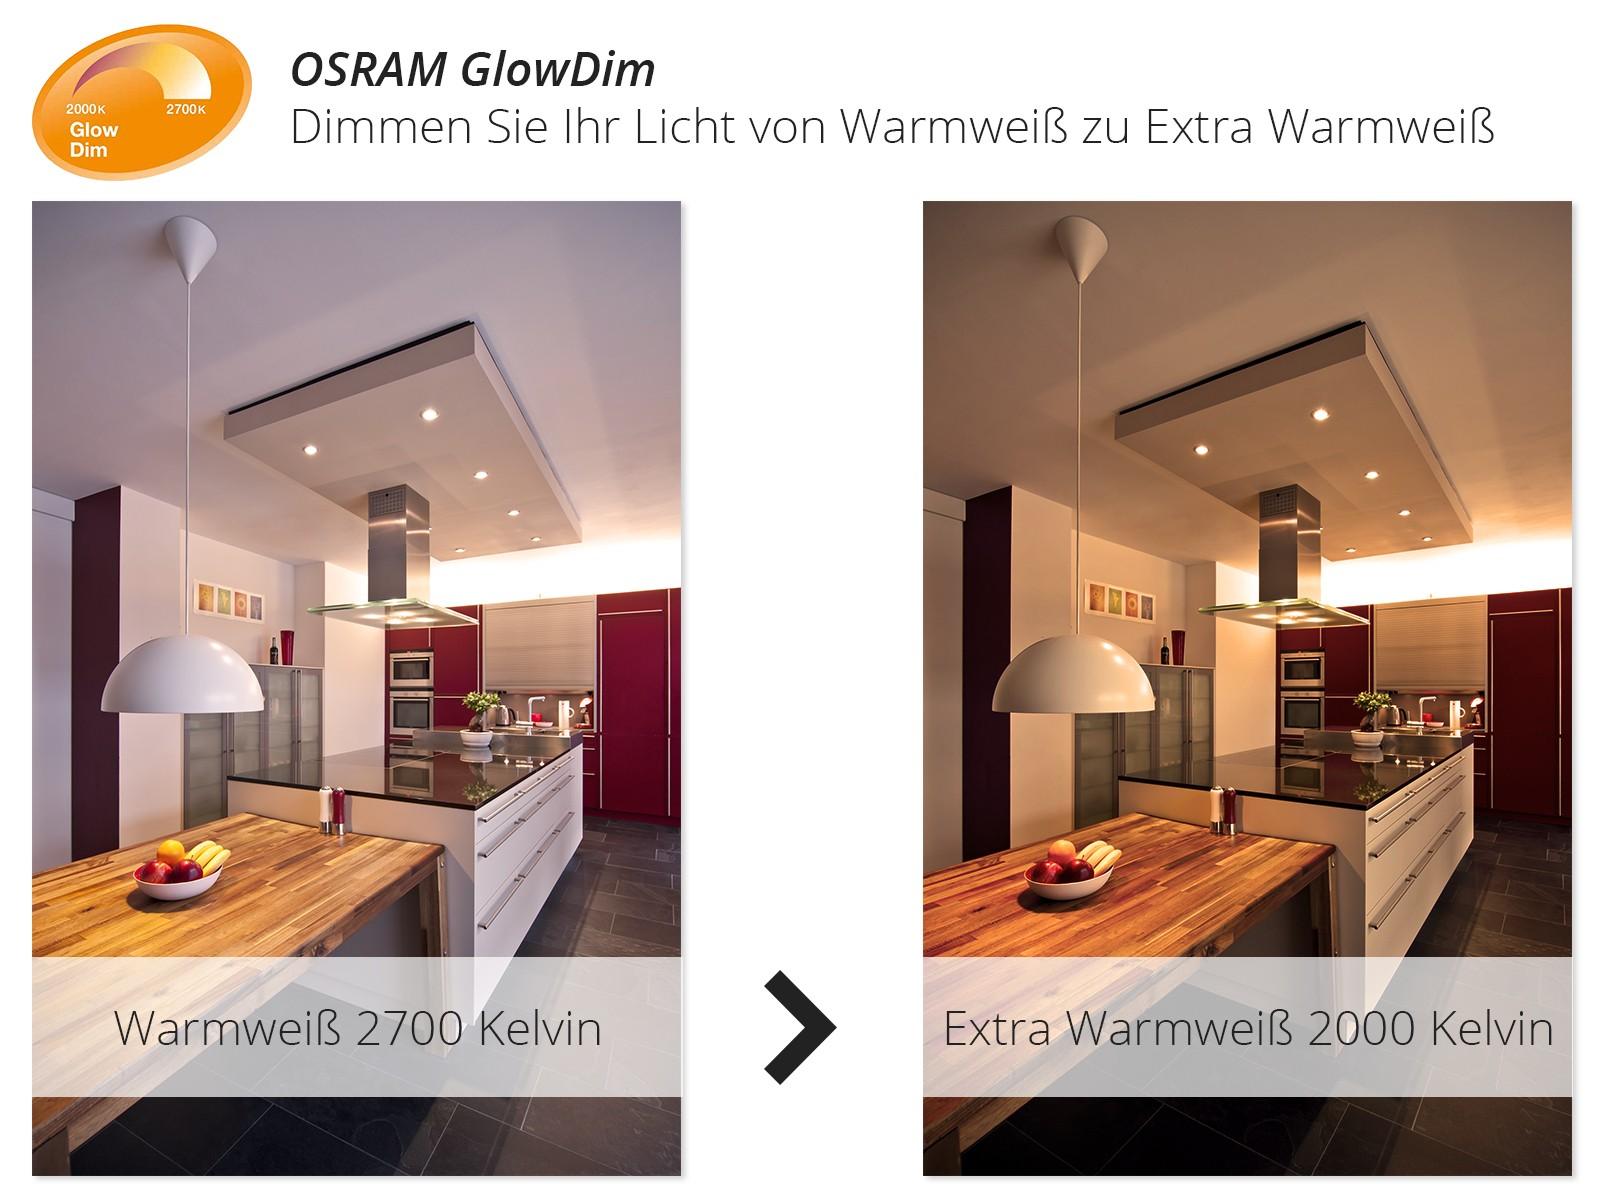 QW-1 Feuchtraum LED-Einbaustrahler Bad Edelstahl gebürstet, IP65, 5 ...